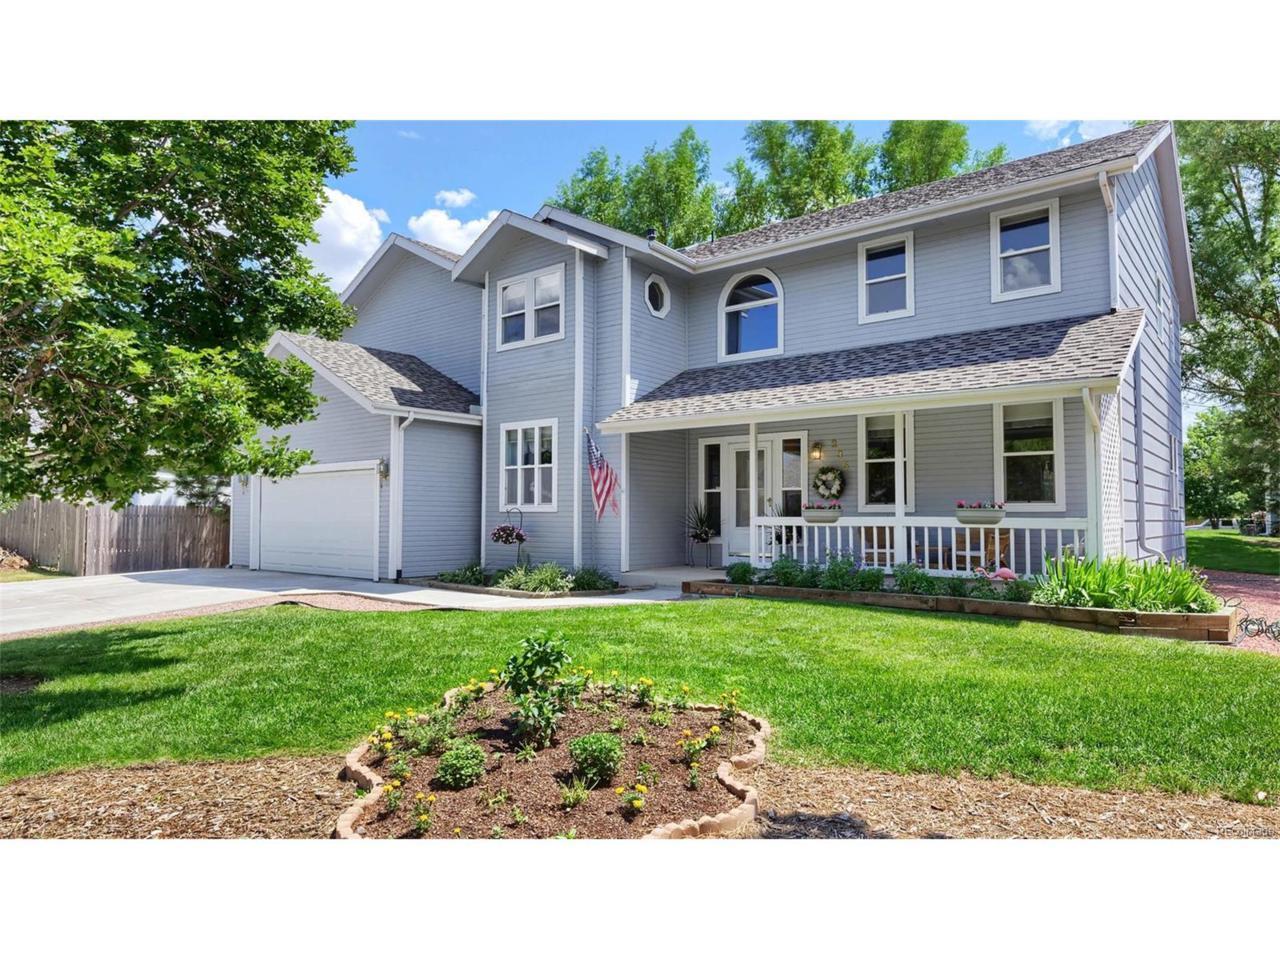 235 Tamarron Drive, Colorado Springs, CO 80919 (MLS #4274610) :: 8z Real Estate